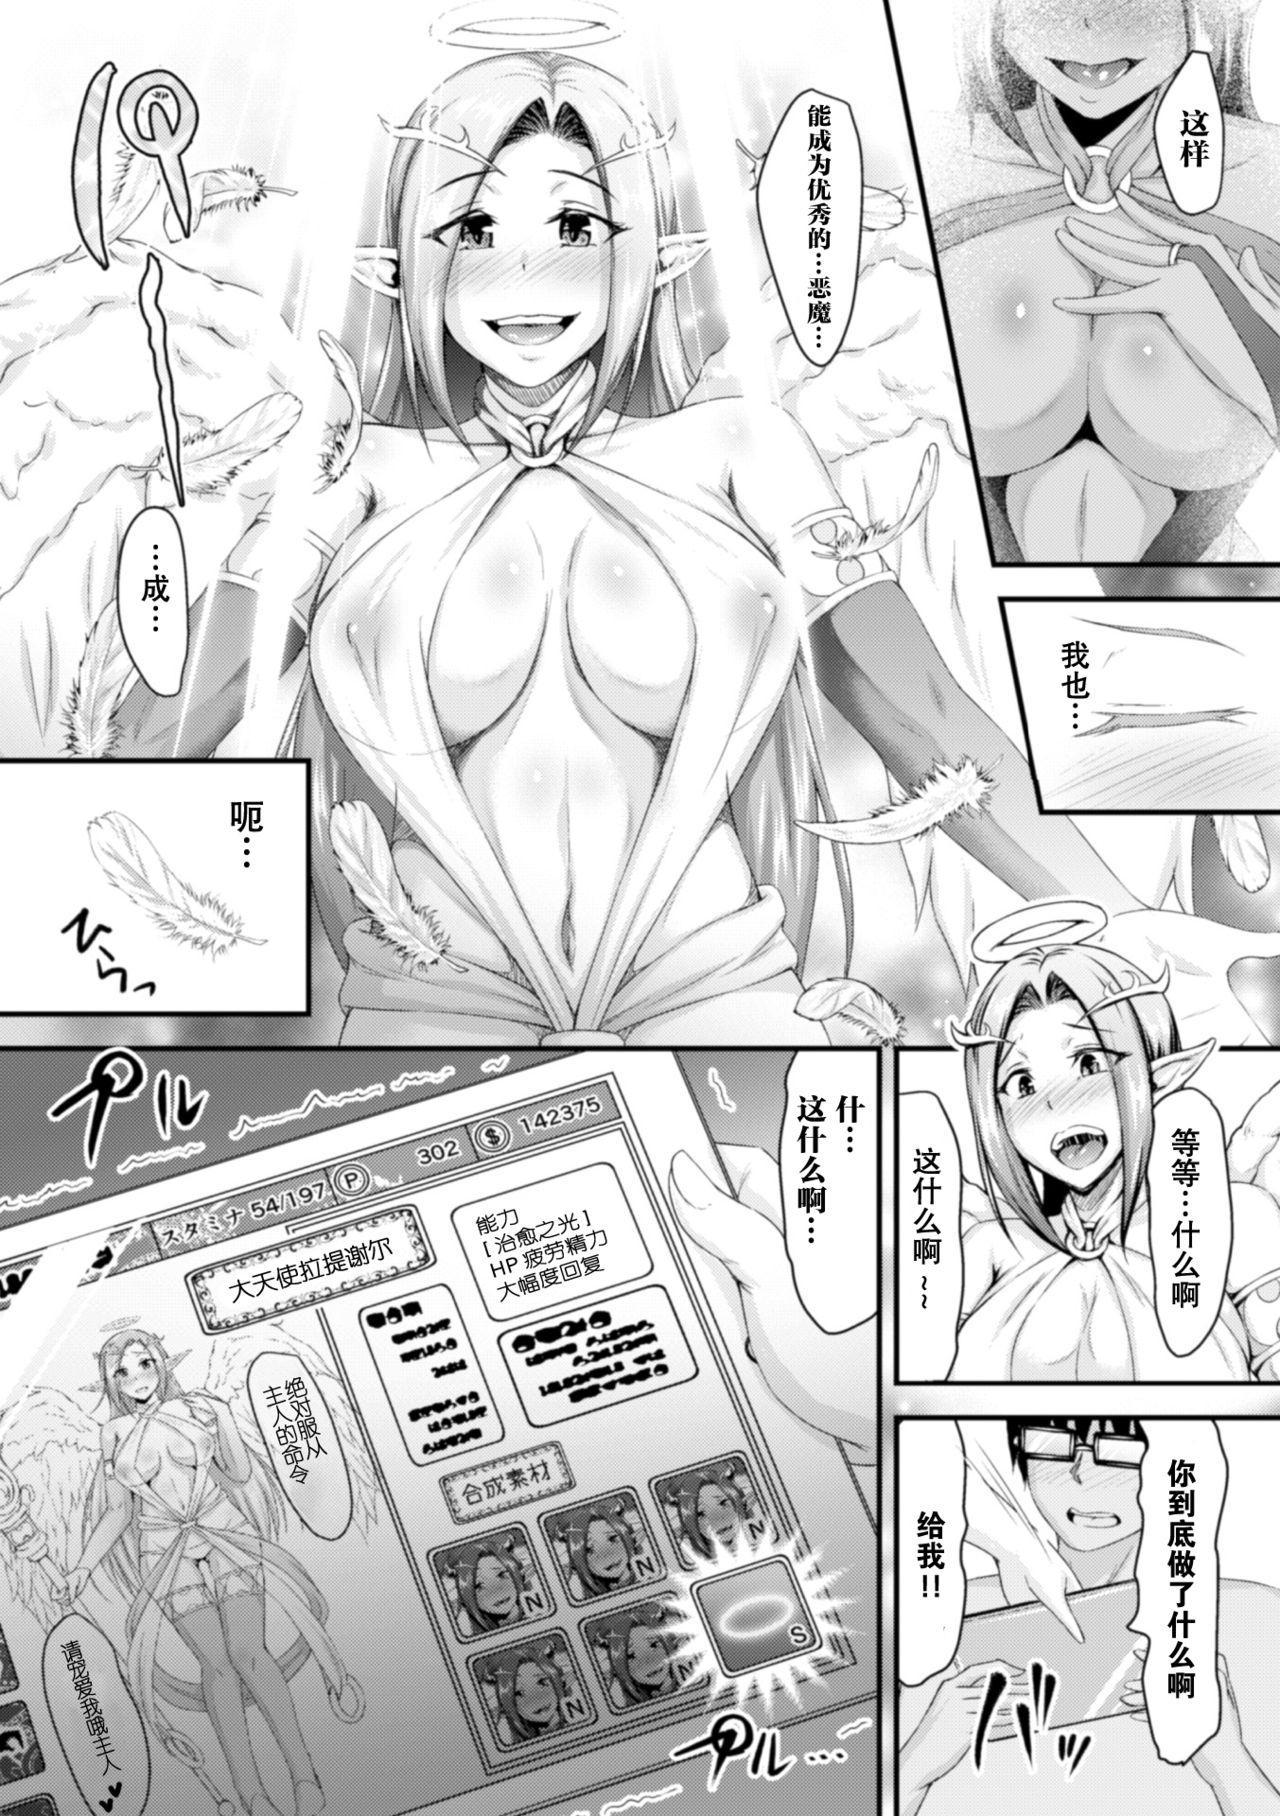 2D Comic Magazine Tenshi ni Ochiru Akuma-tachi Vol. 1 76